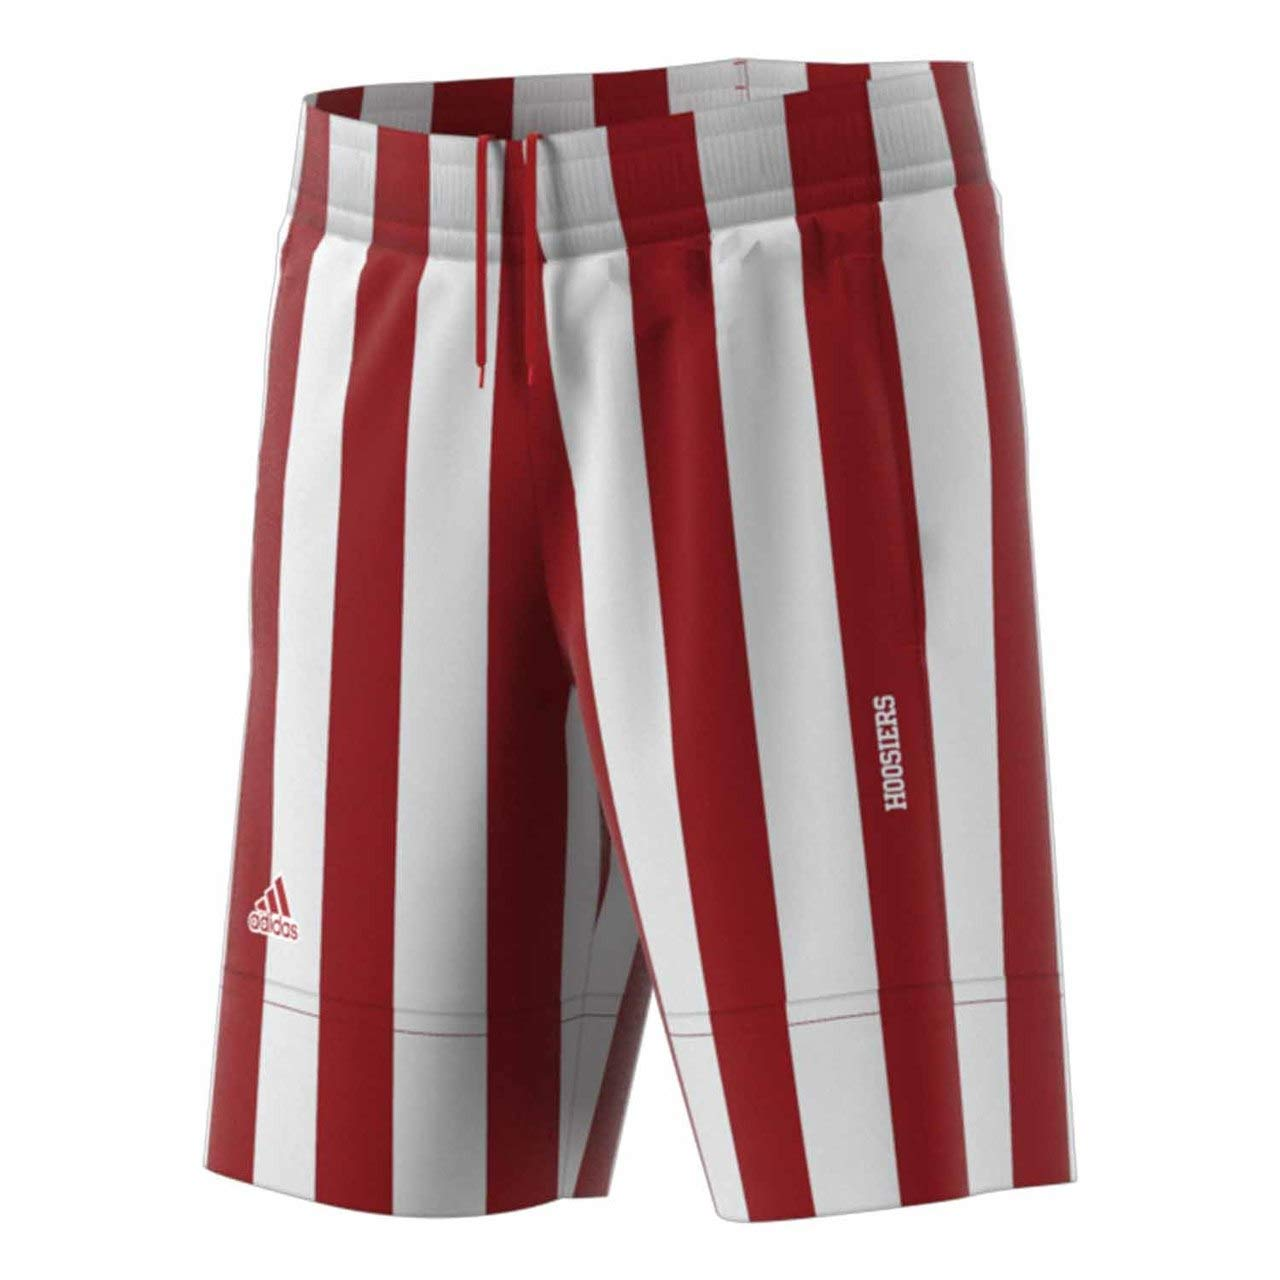 Amazon.com: adidas Indiana Hoosiers - Pantalones cortos para ...